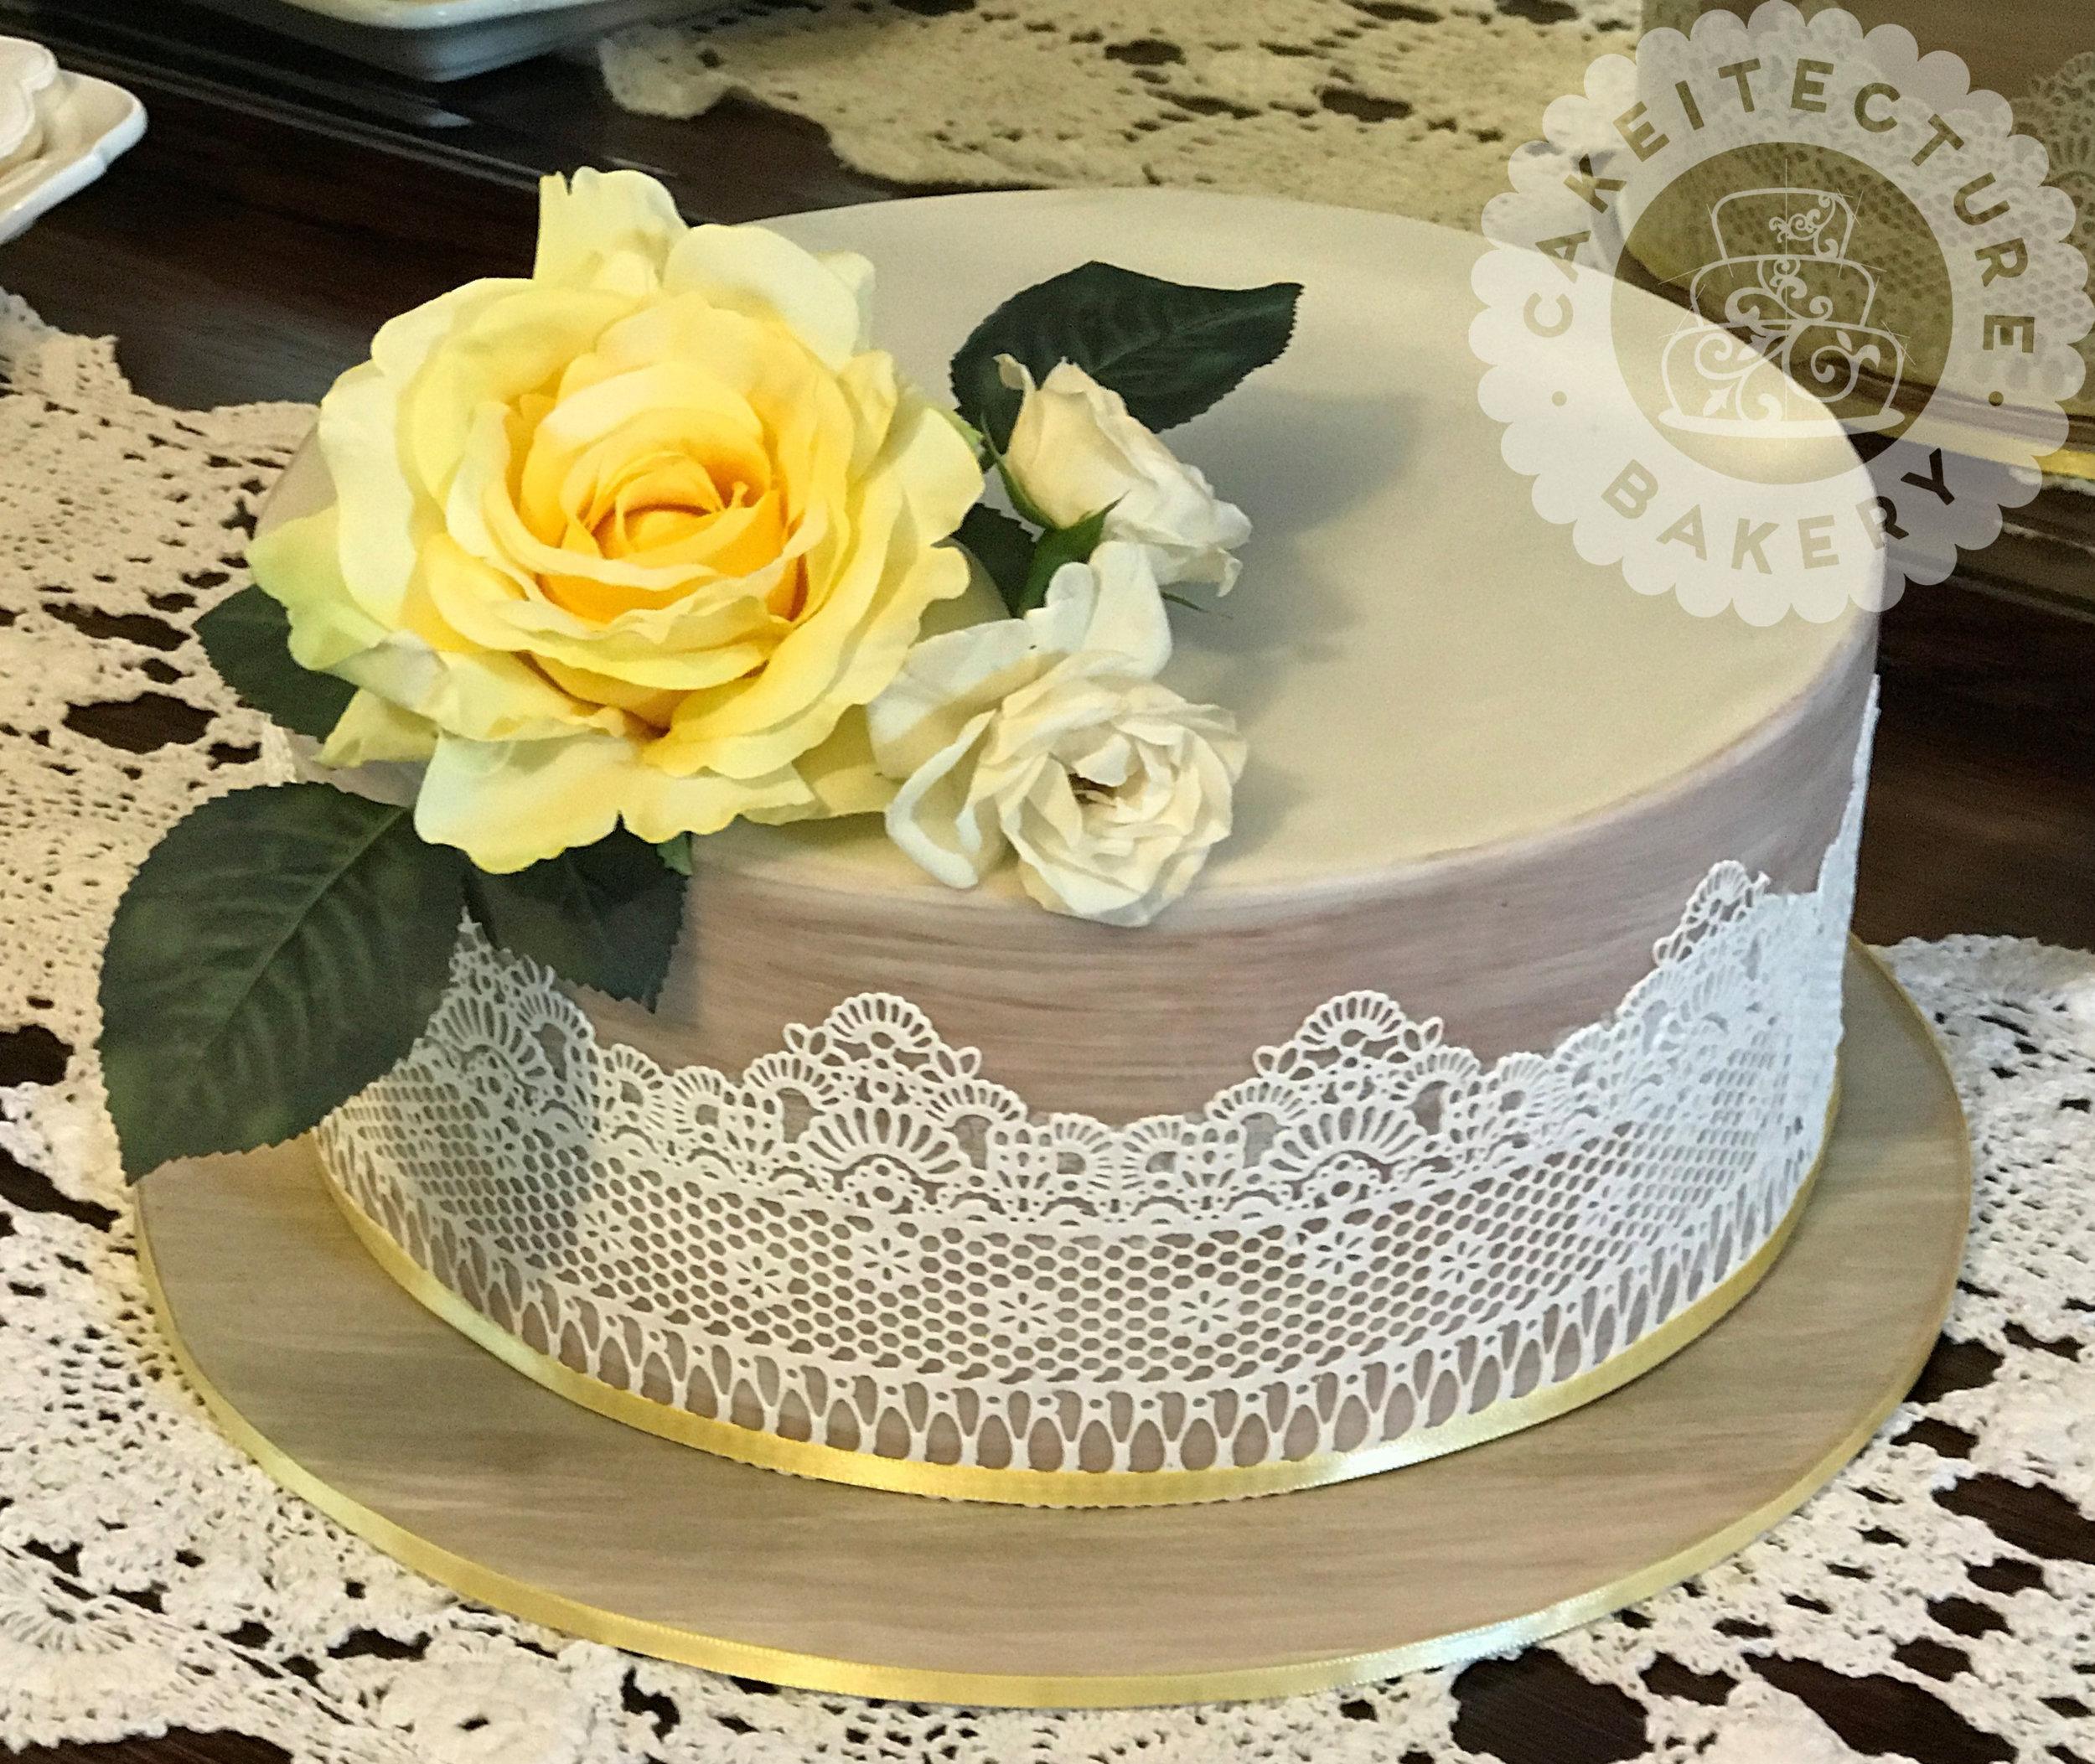 Cakeitecture Bakery shower cake (2).jpg